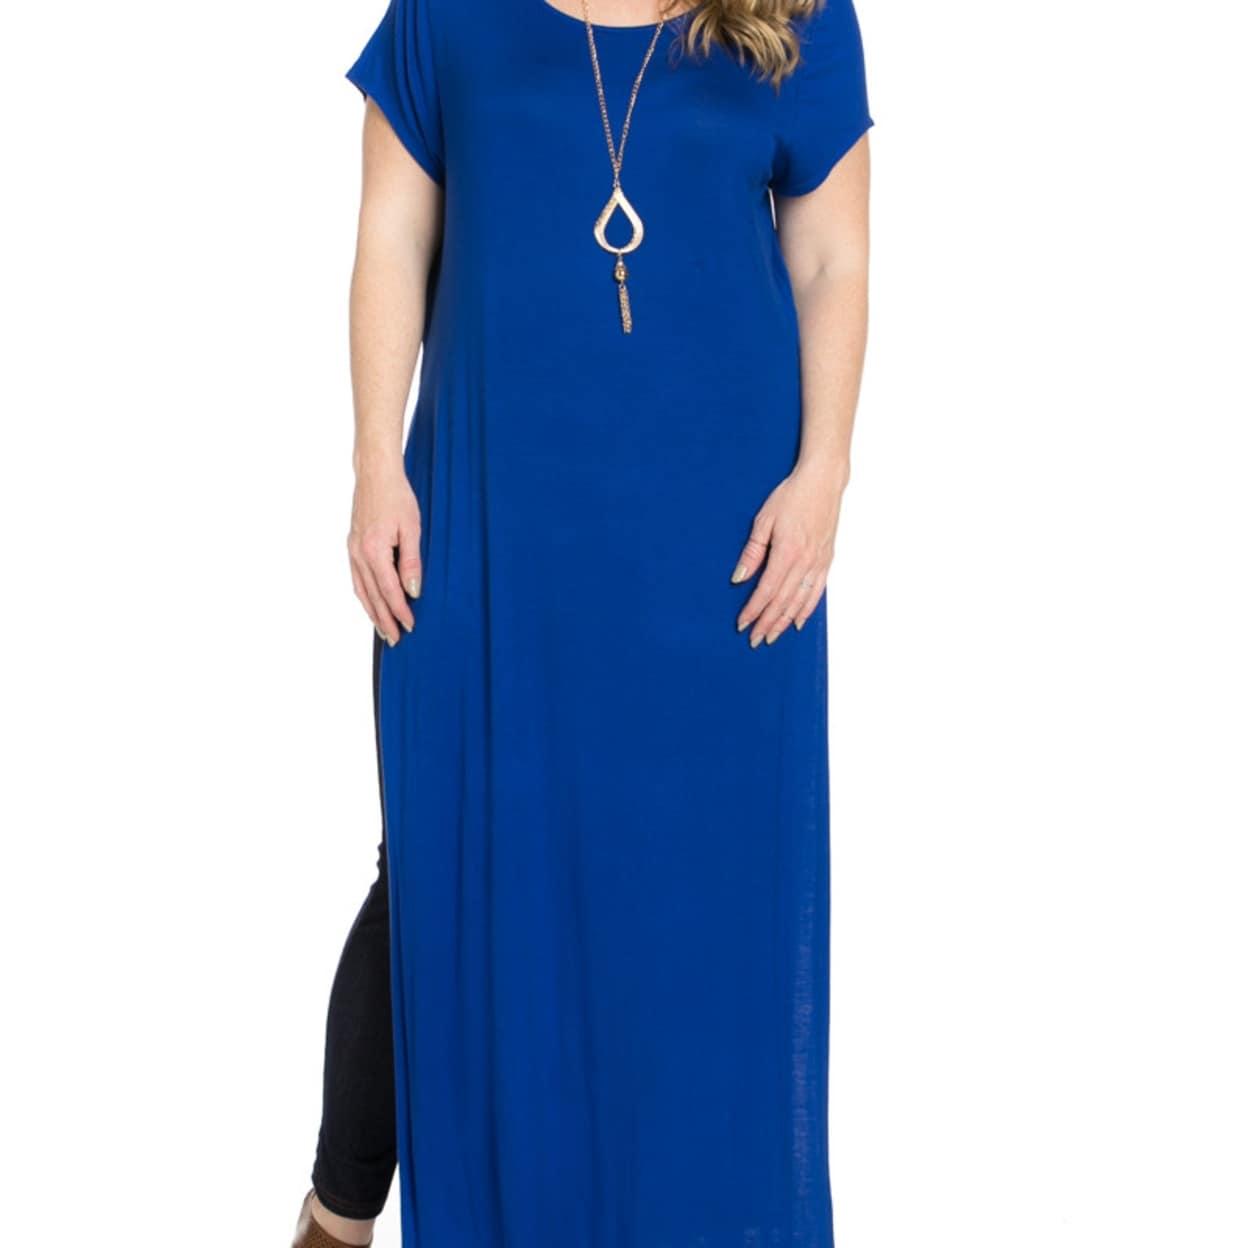 Shop Side Slit Royal Blue Maxi Dress Plus Size - Royal Blue - Free ...